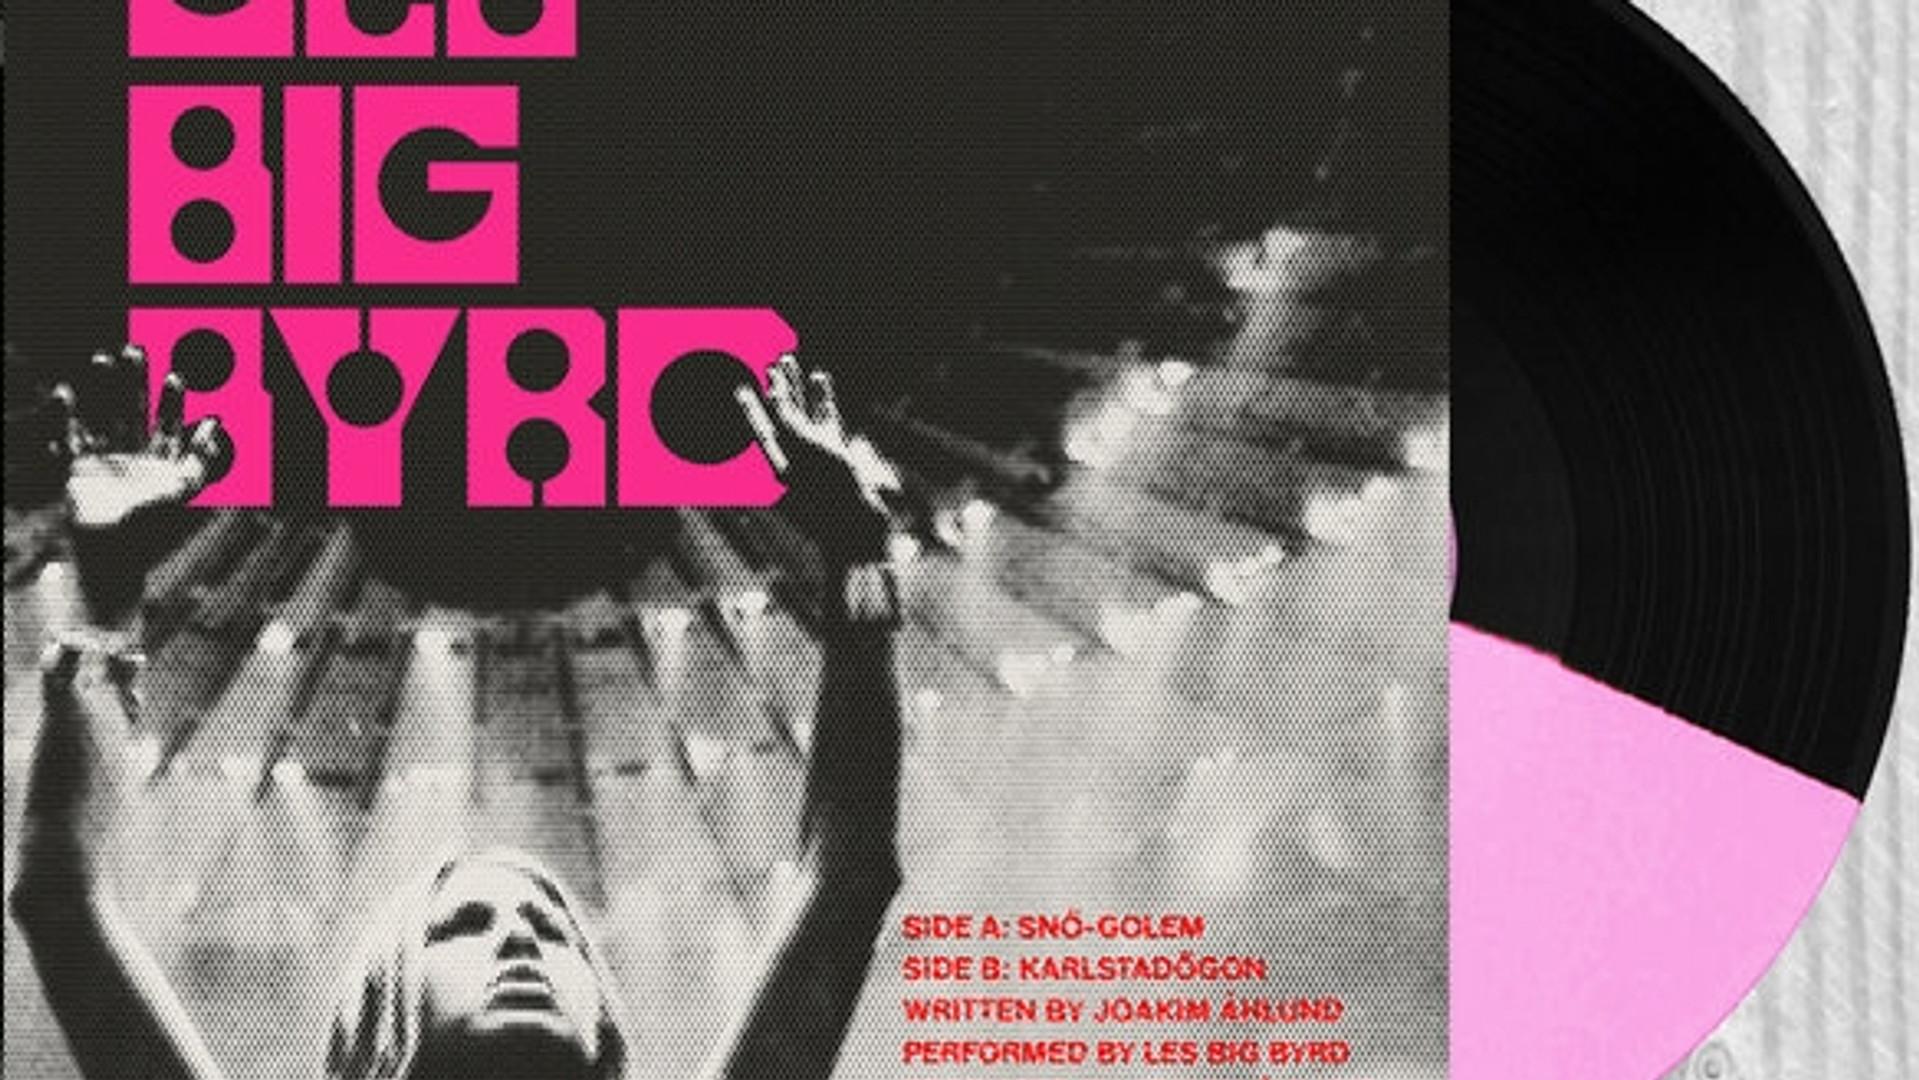 Les Big Byrd - Sno-Golem (Live)